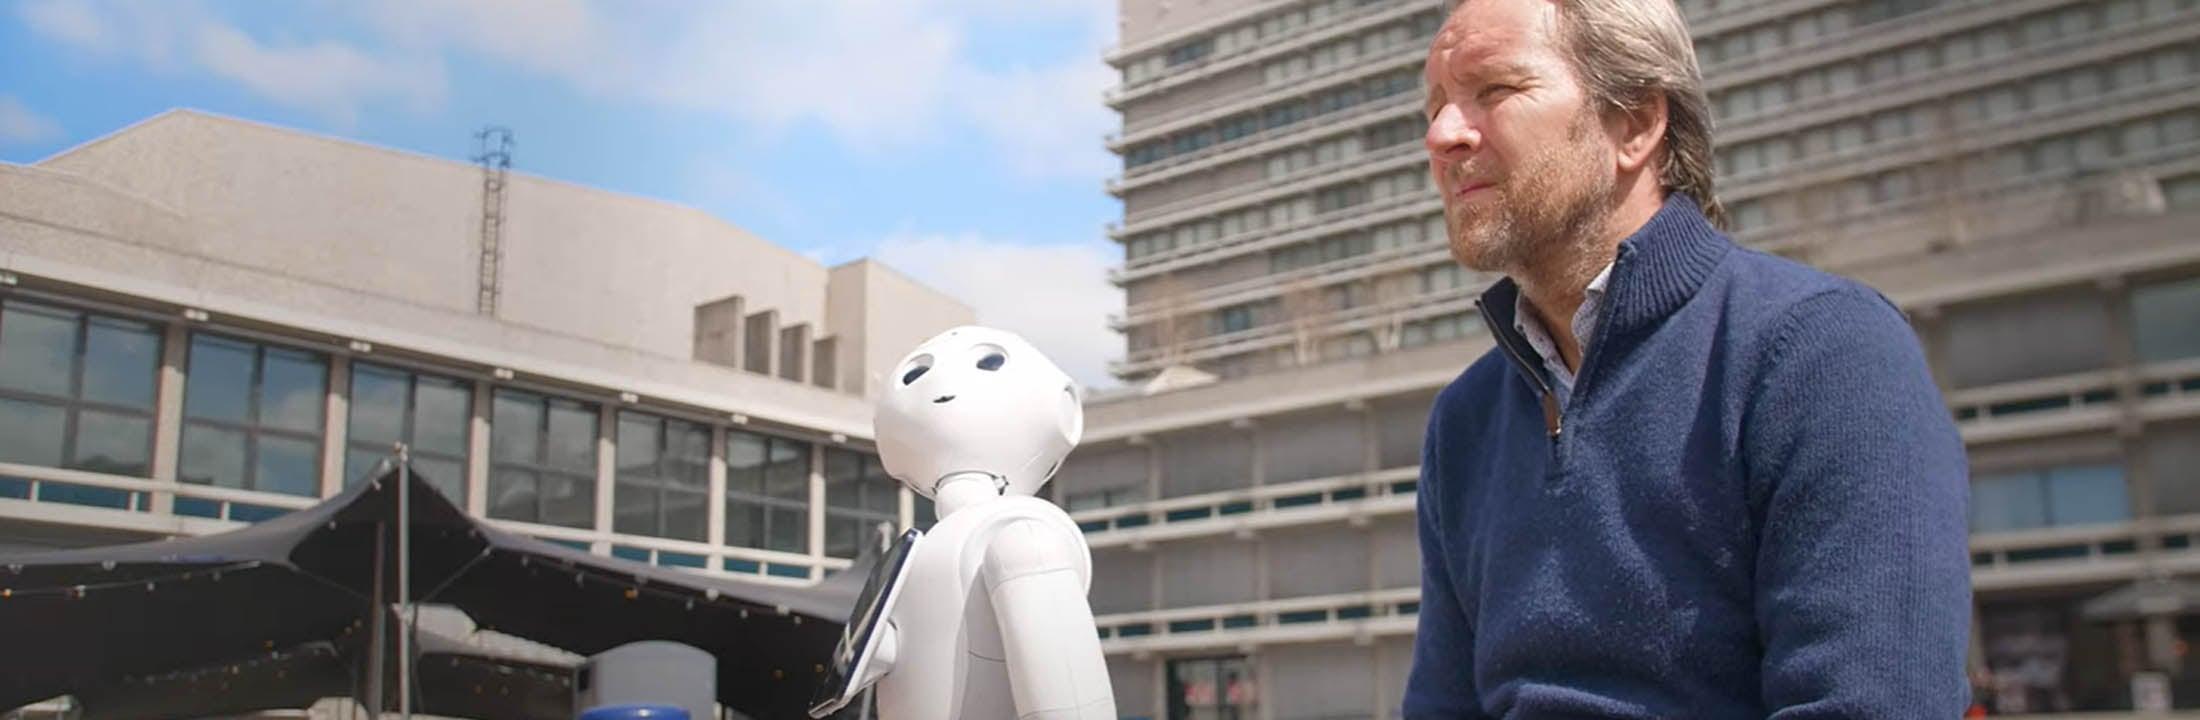 Teaching robots to talk